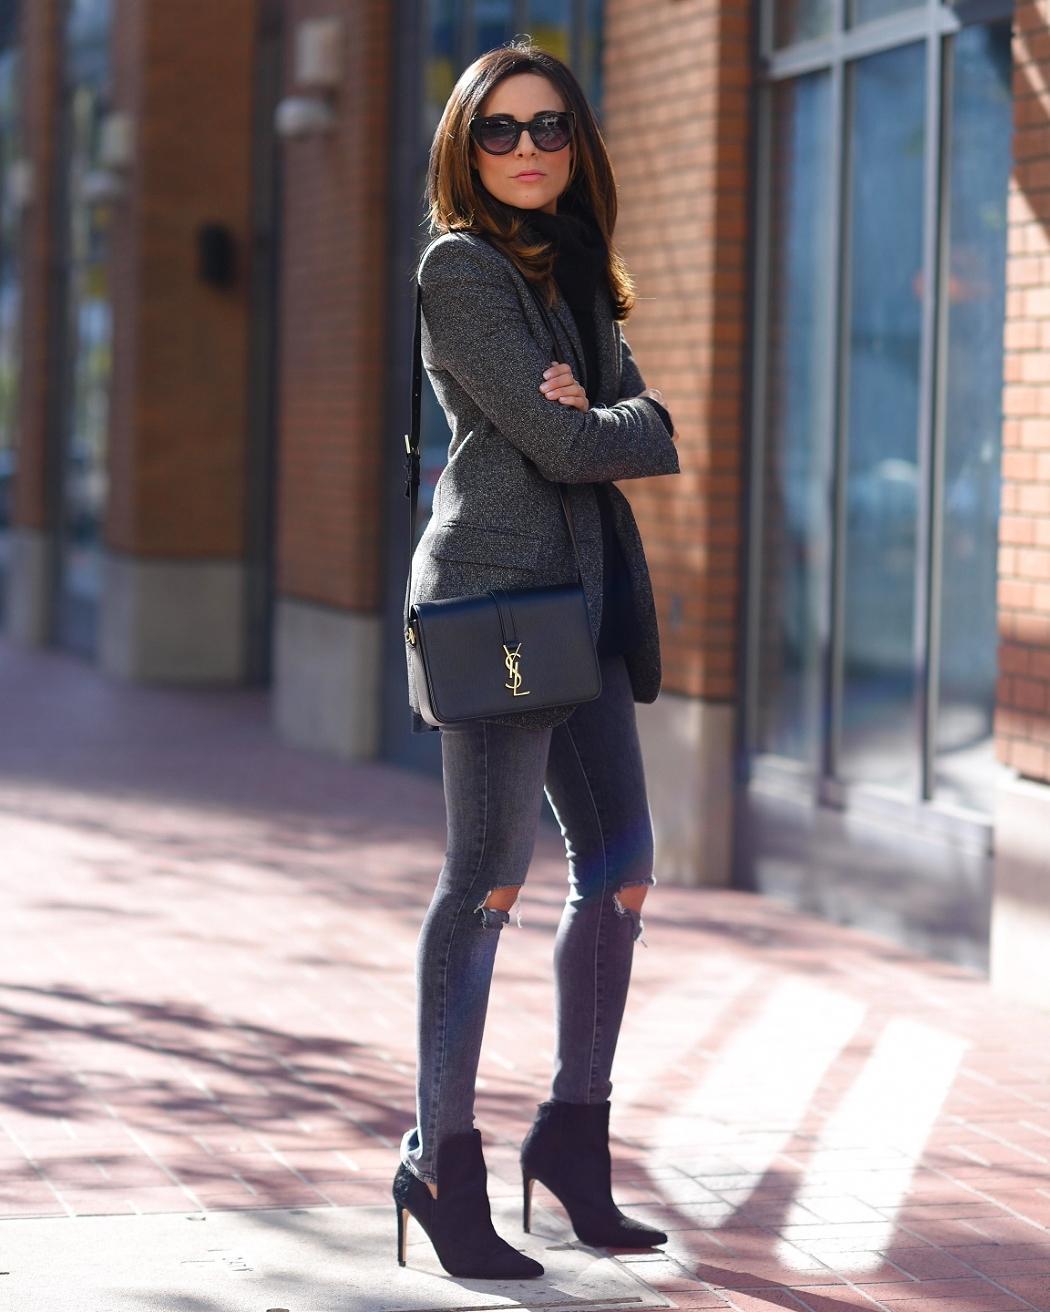 Zara_Wool_Blazer_WoolBlazer_Madewell_JBrand_SaintLaurent_Fashion_FashionBlogger_SanDiego_Gaslamp_Streetstyle_LucysWhims.jpg